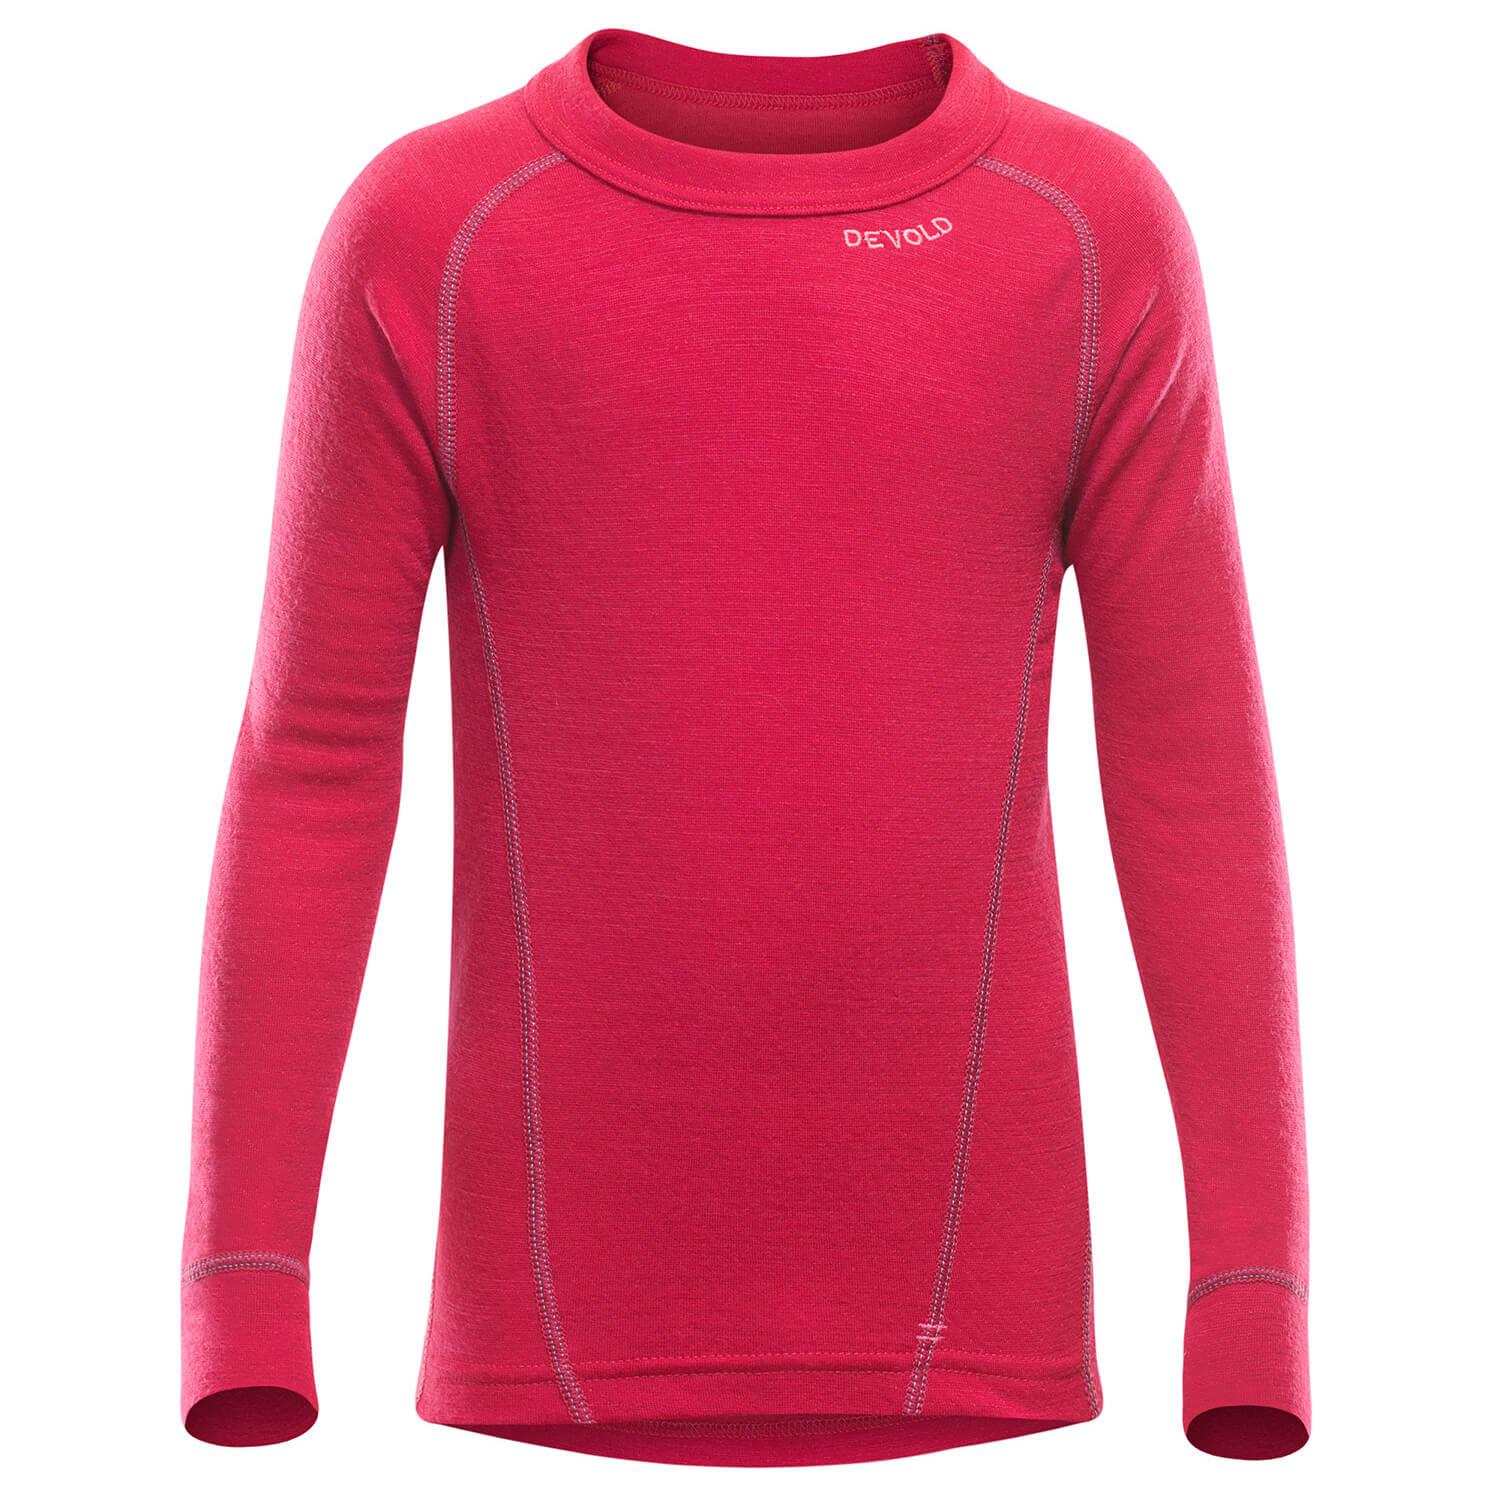 Devold Duo Active Junior Shirt Merino undertøj Børn køb